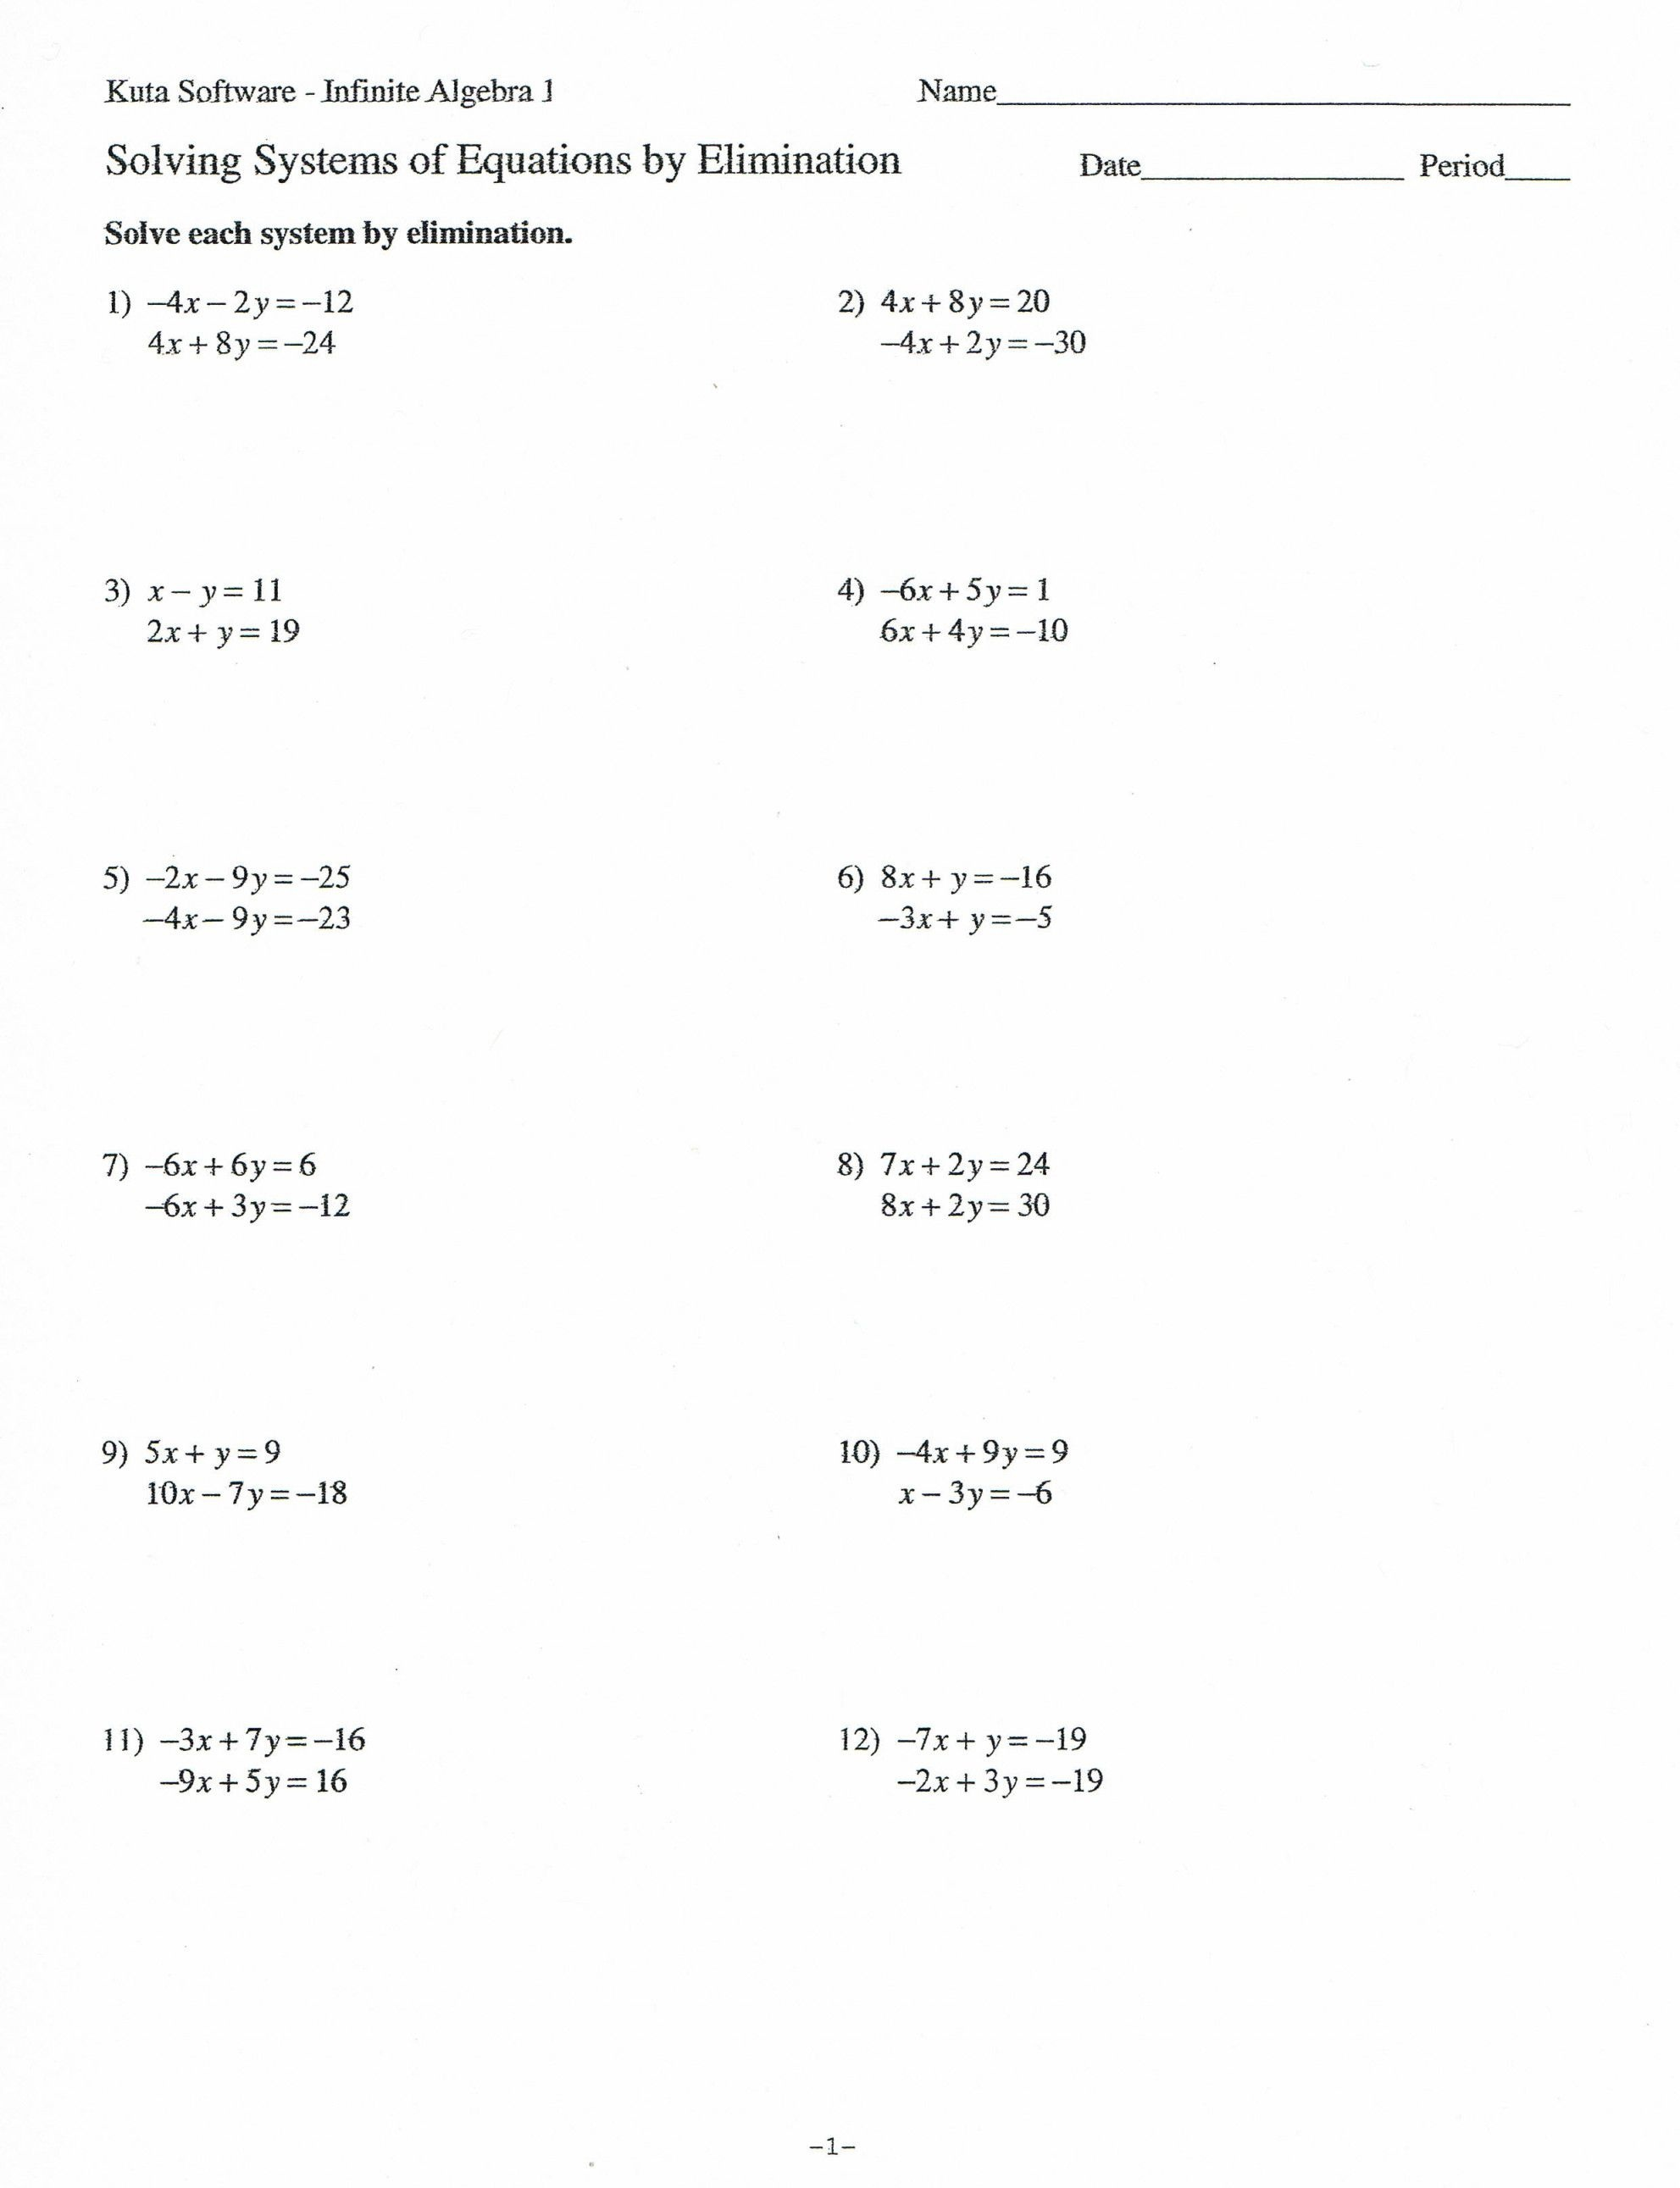 Distributive Property Worksheets 6Th Grade | Lobo Black - Free Printable Distributive Property Worksheets